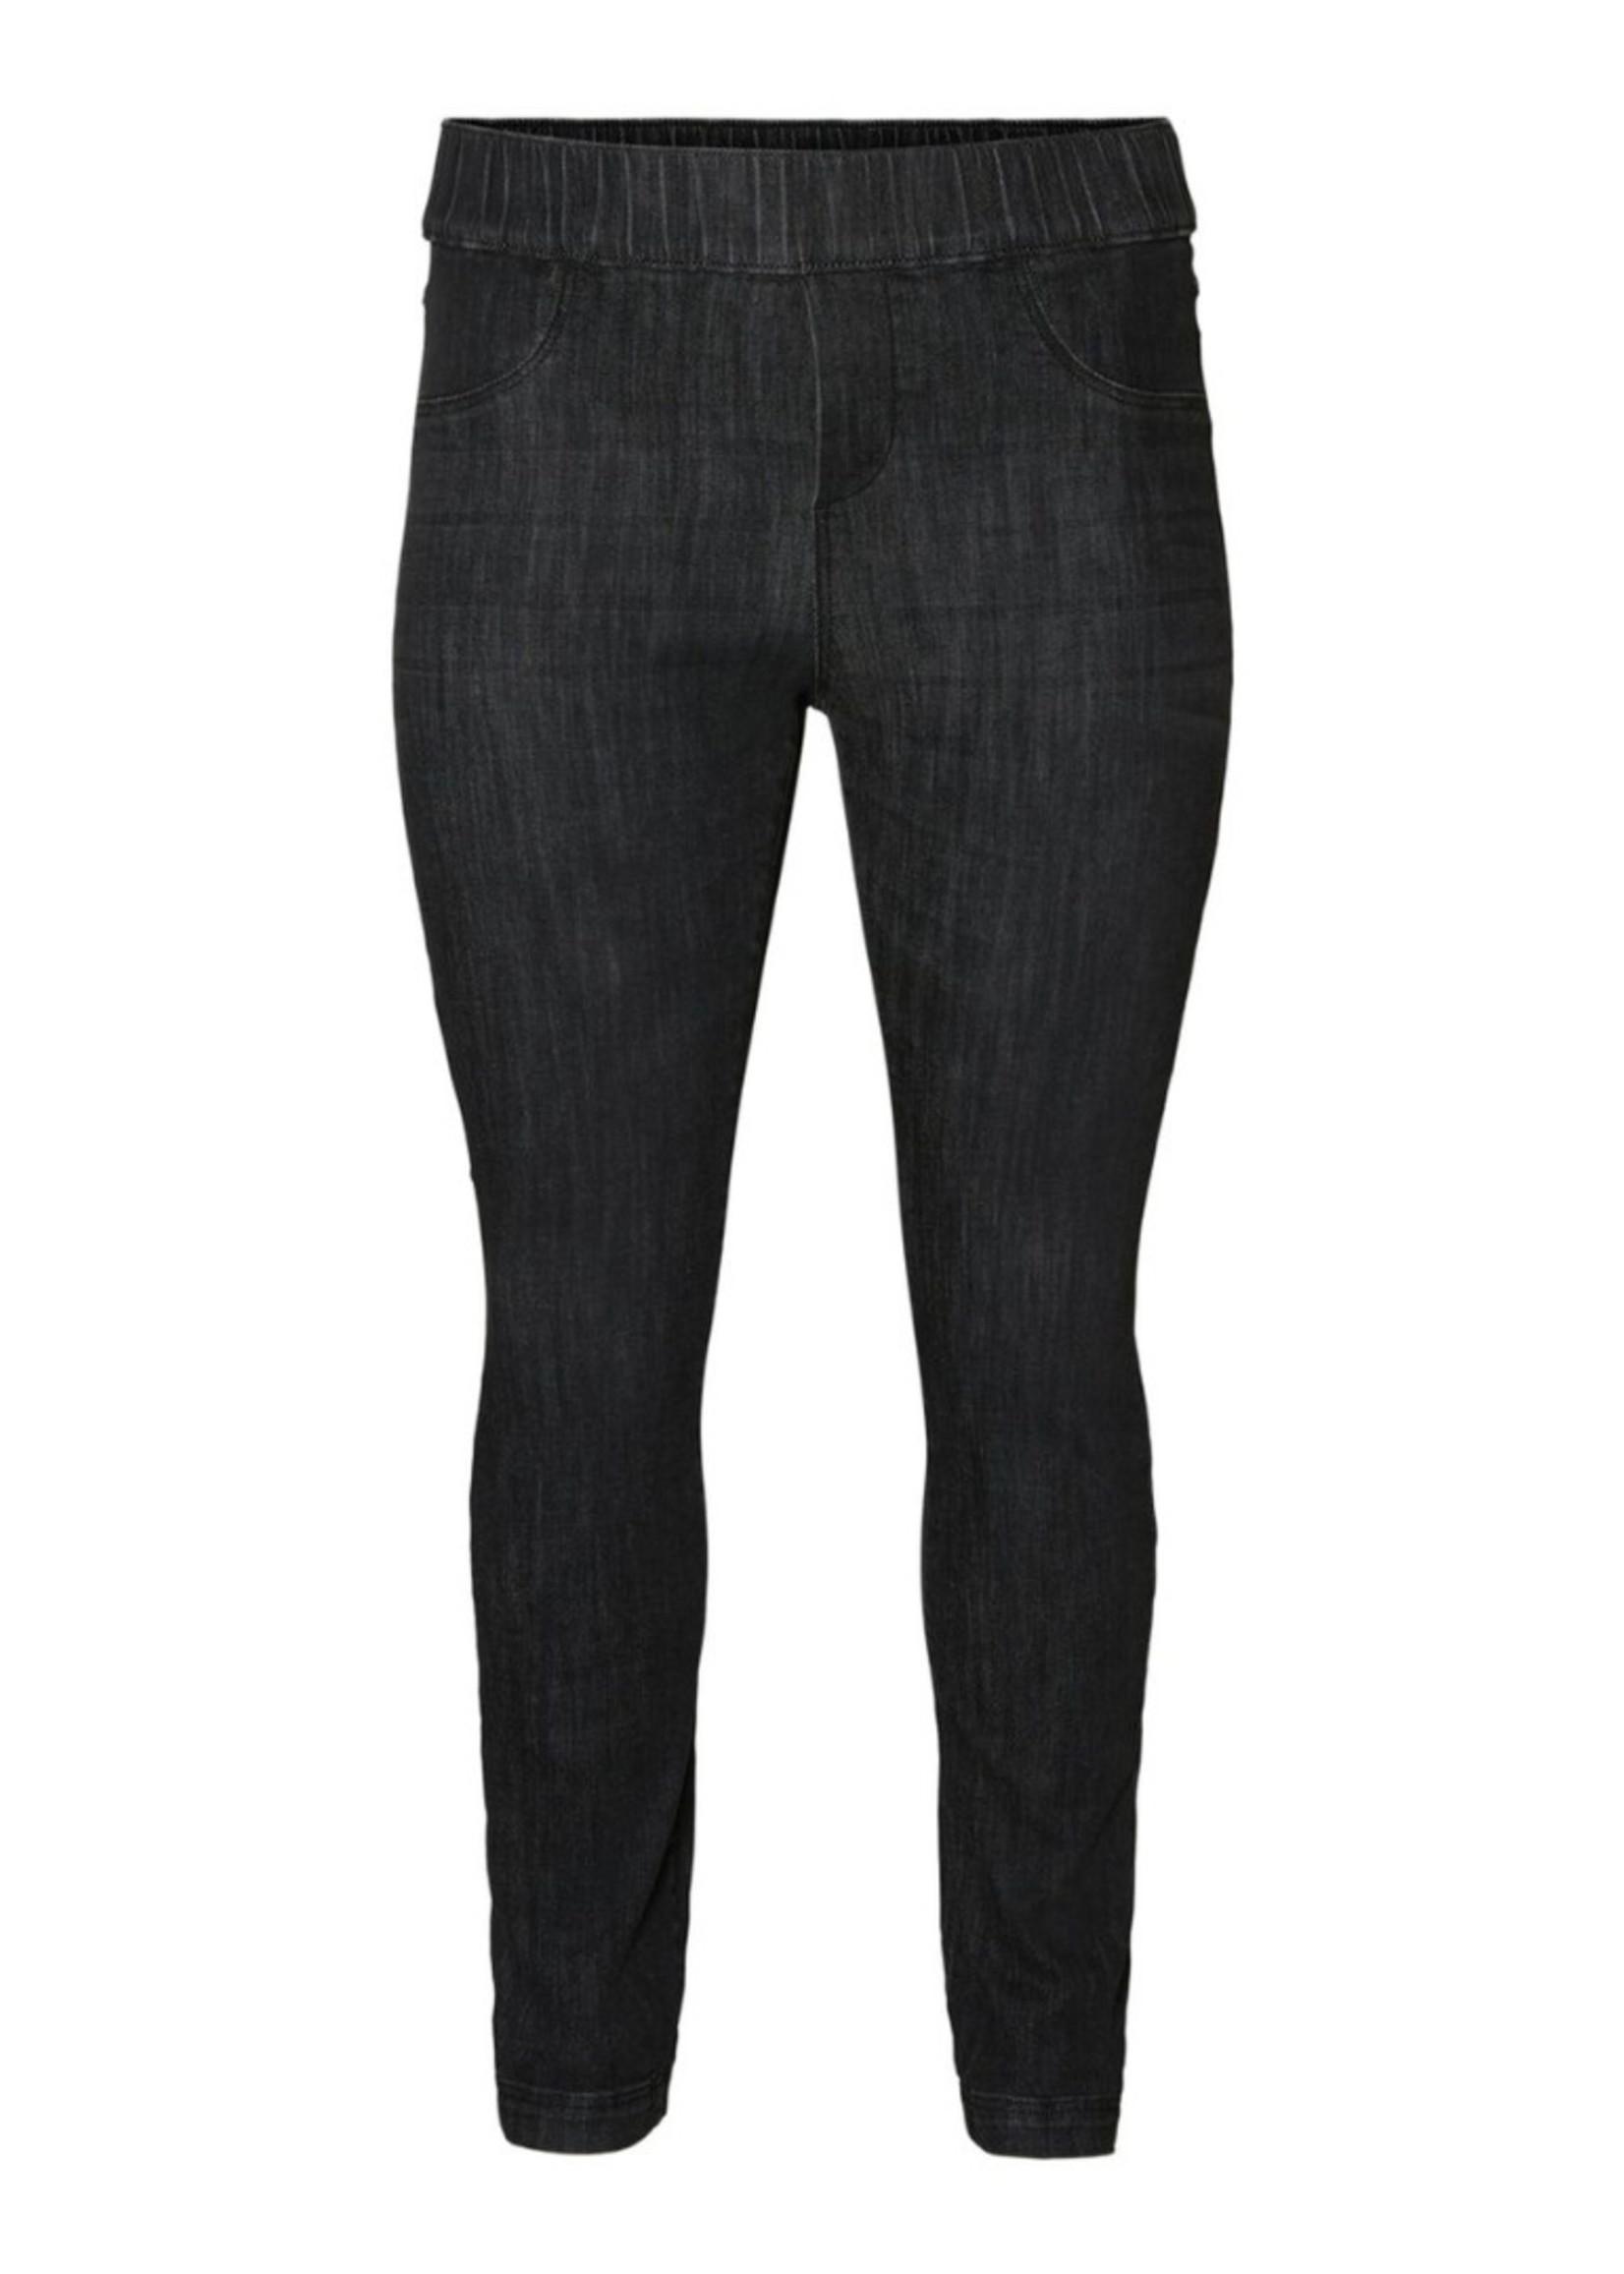 Junarose by Vero Moda Junarose Zero Daria Jeans